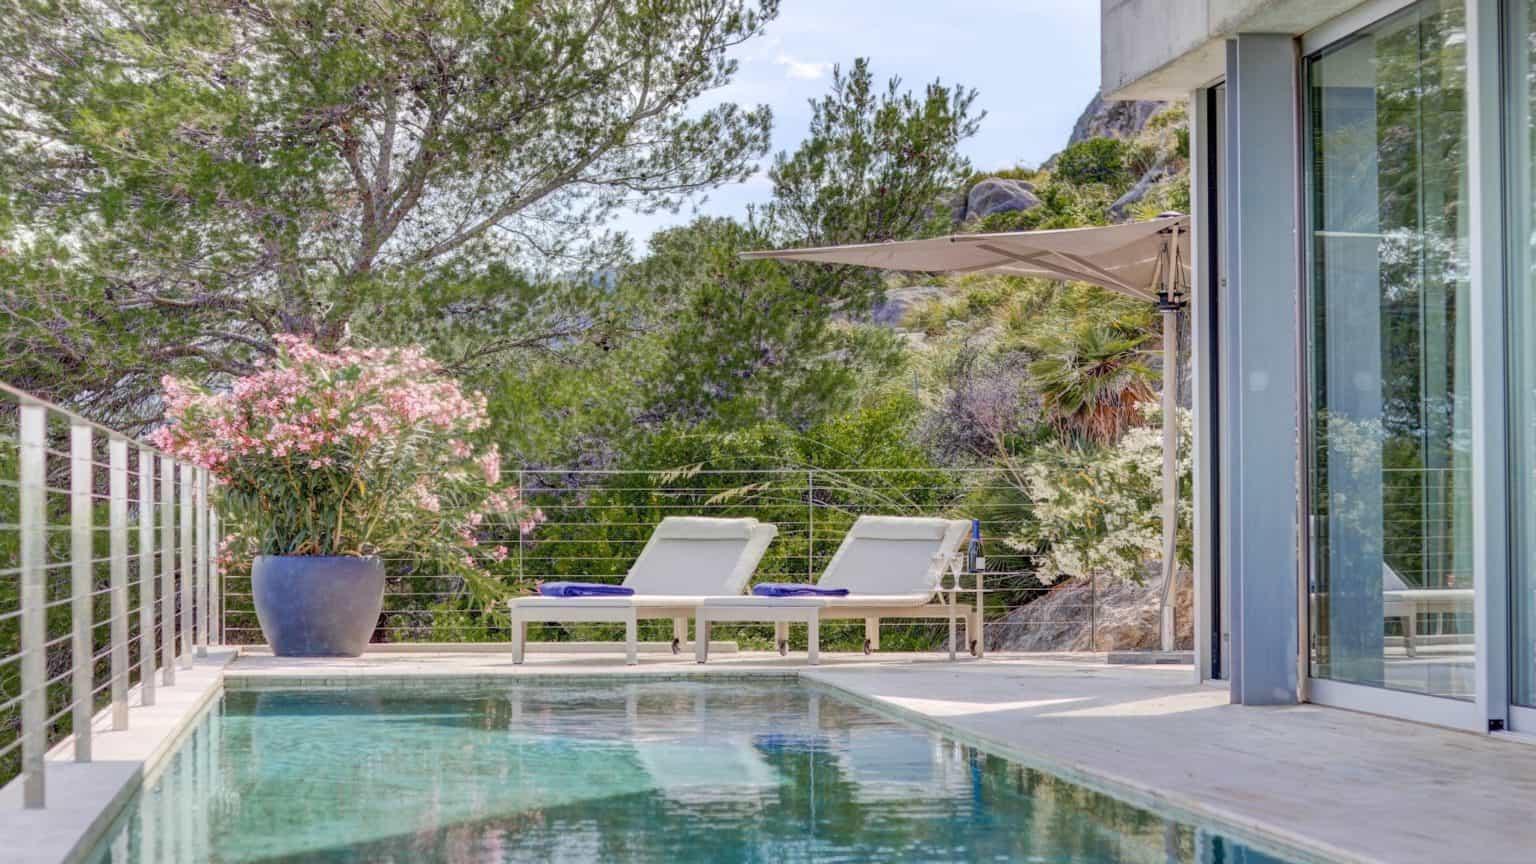 Villa Rental Mallorca - 4 Bedrooms - Balearic Bliss - Corazon de Piedra - poolside loungers